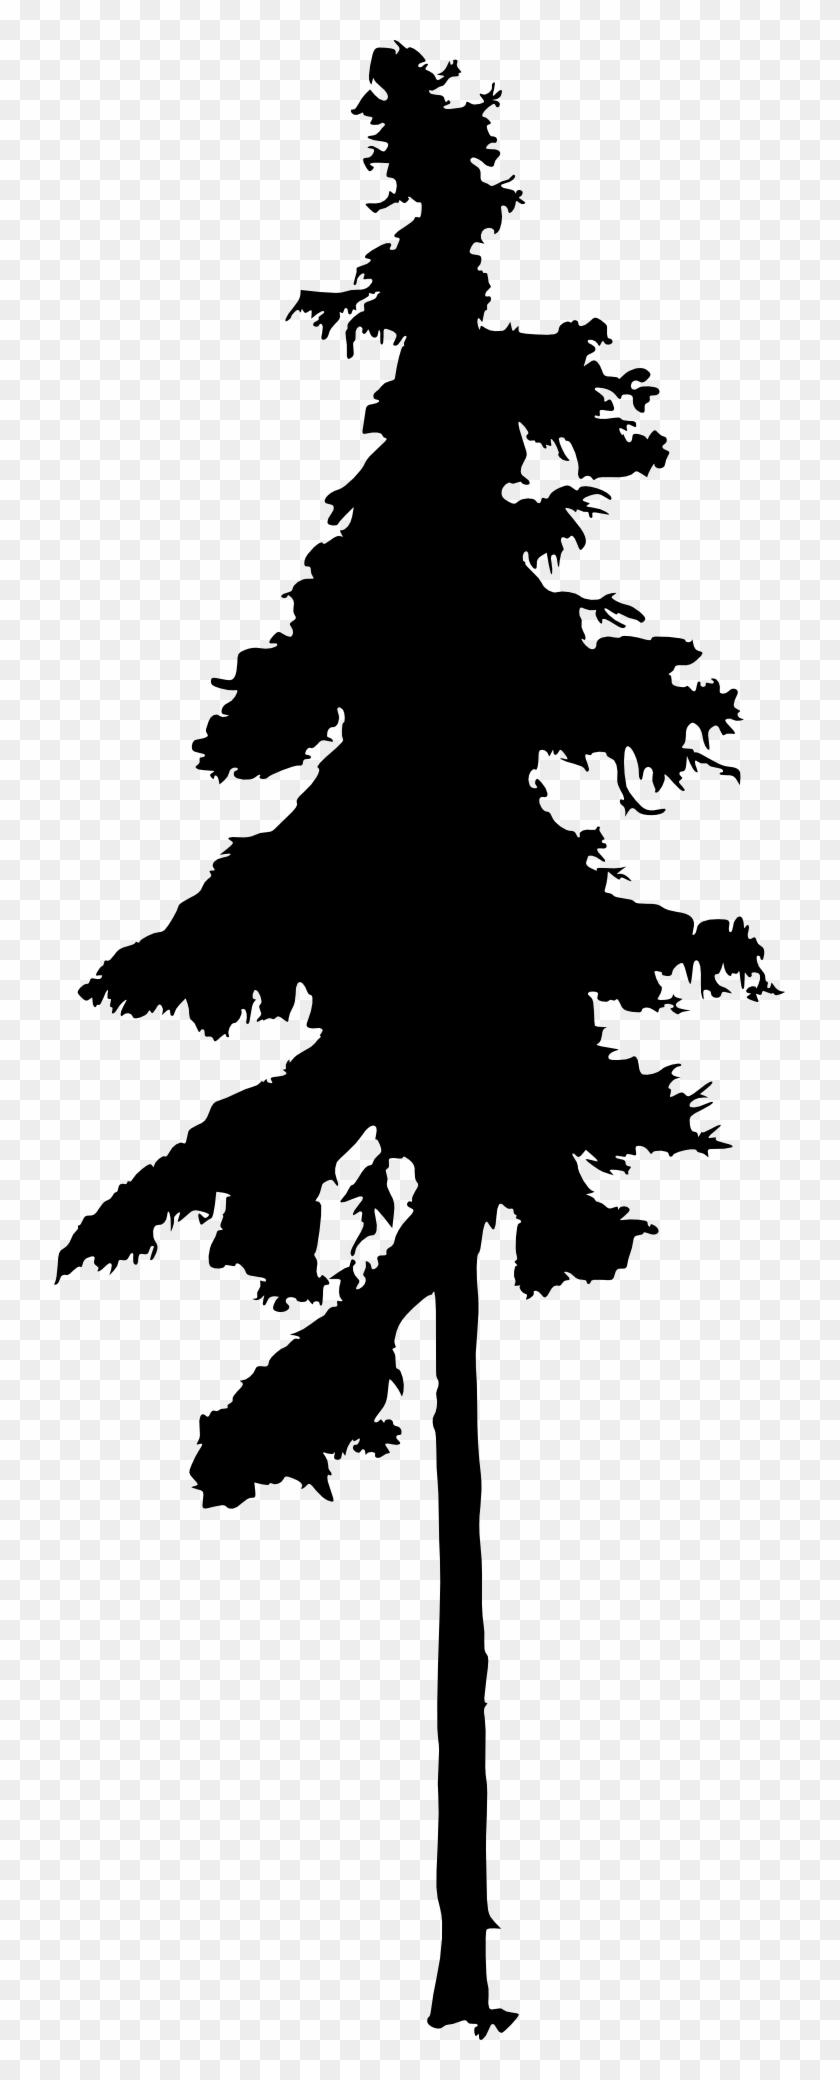 Pine Tree Drawing - Tall Pine Tree Silhouette #401356